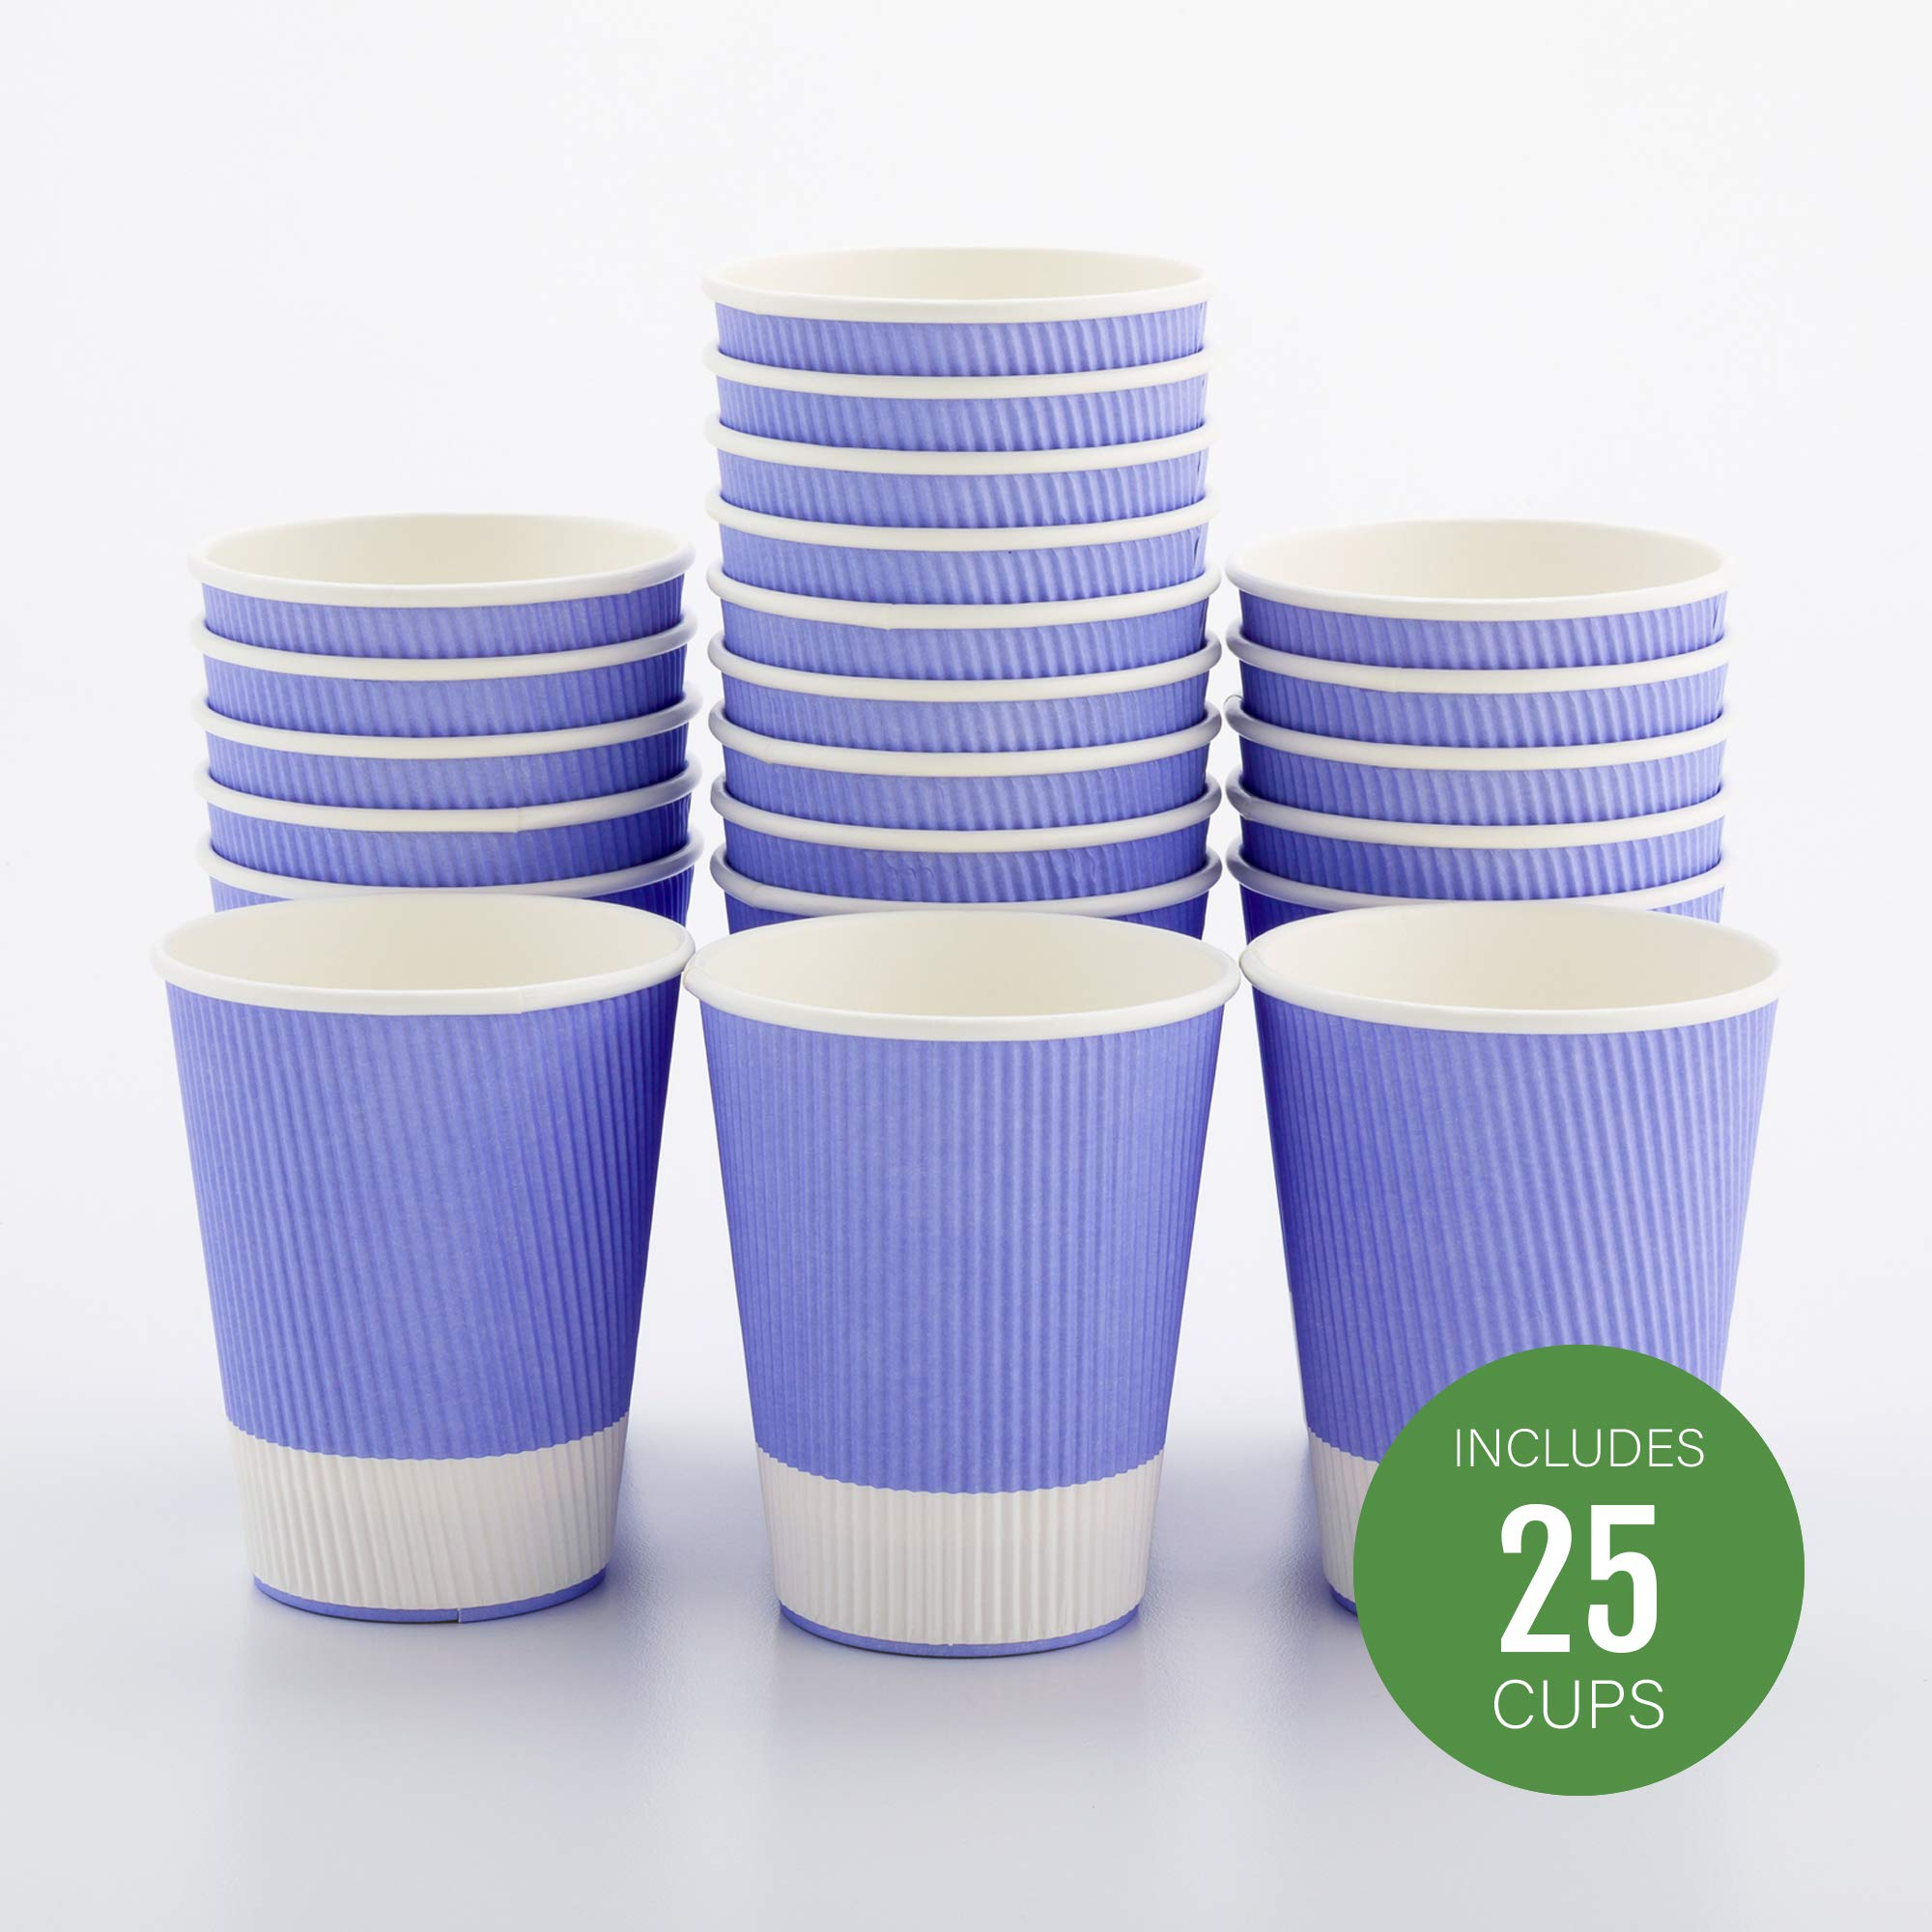 Insulated Paper Coffee Cups - Ripple Wall - Light Purple - 12 oz - 25ct Box - MATCHING LIDS SOLD SEPARATELY: RWA0360B, RWA0360W, RWA0328LG, RWA0328GR, RWA0328HP, RWA0283W, RWA0283B